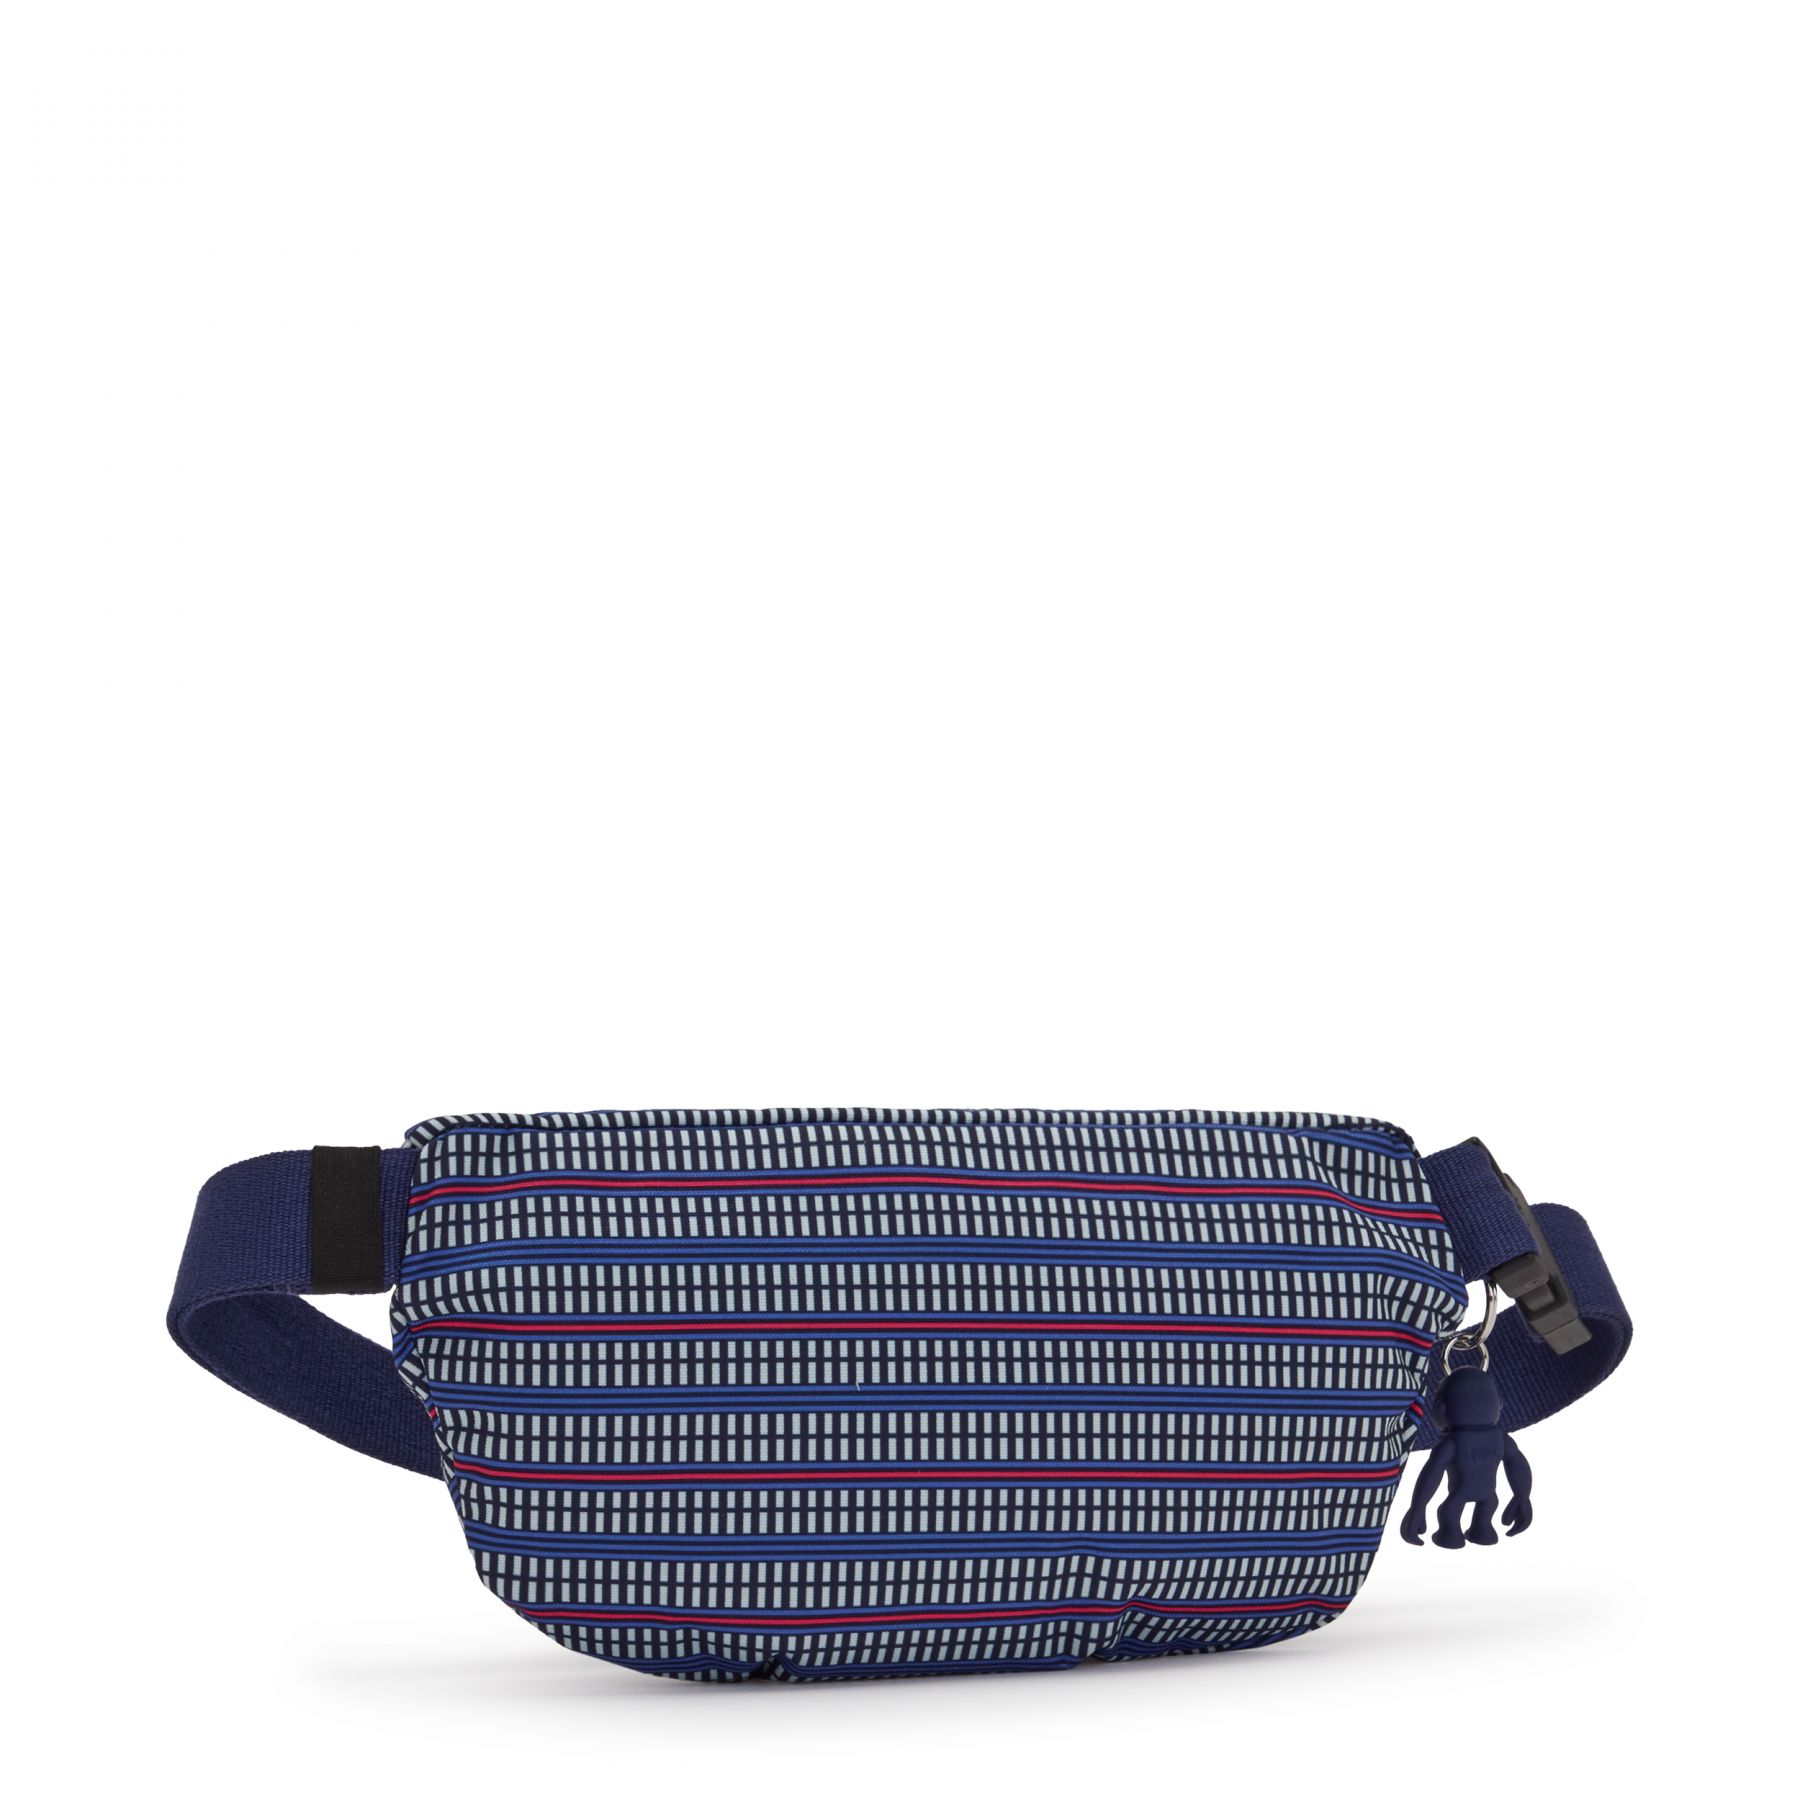 NEW FRESH BAGS by Kipling - Back view